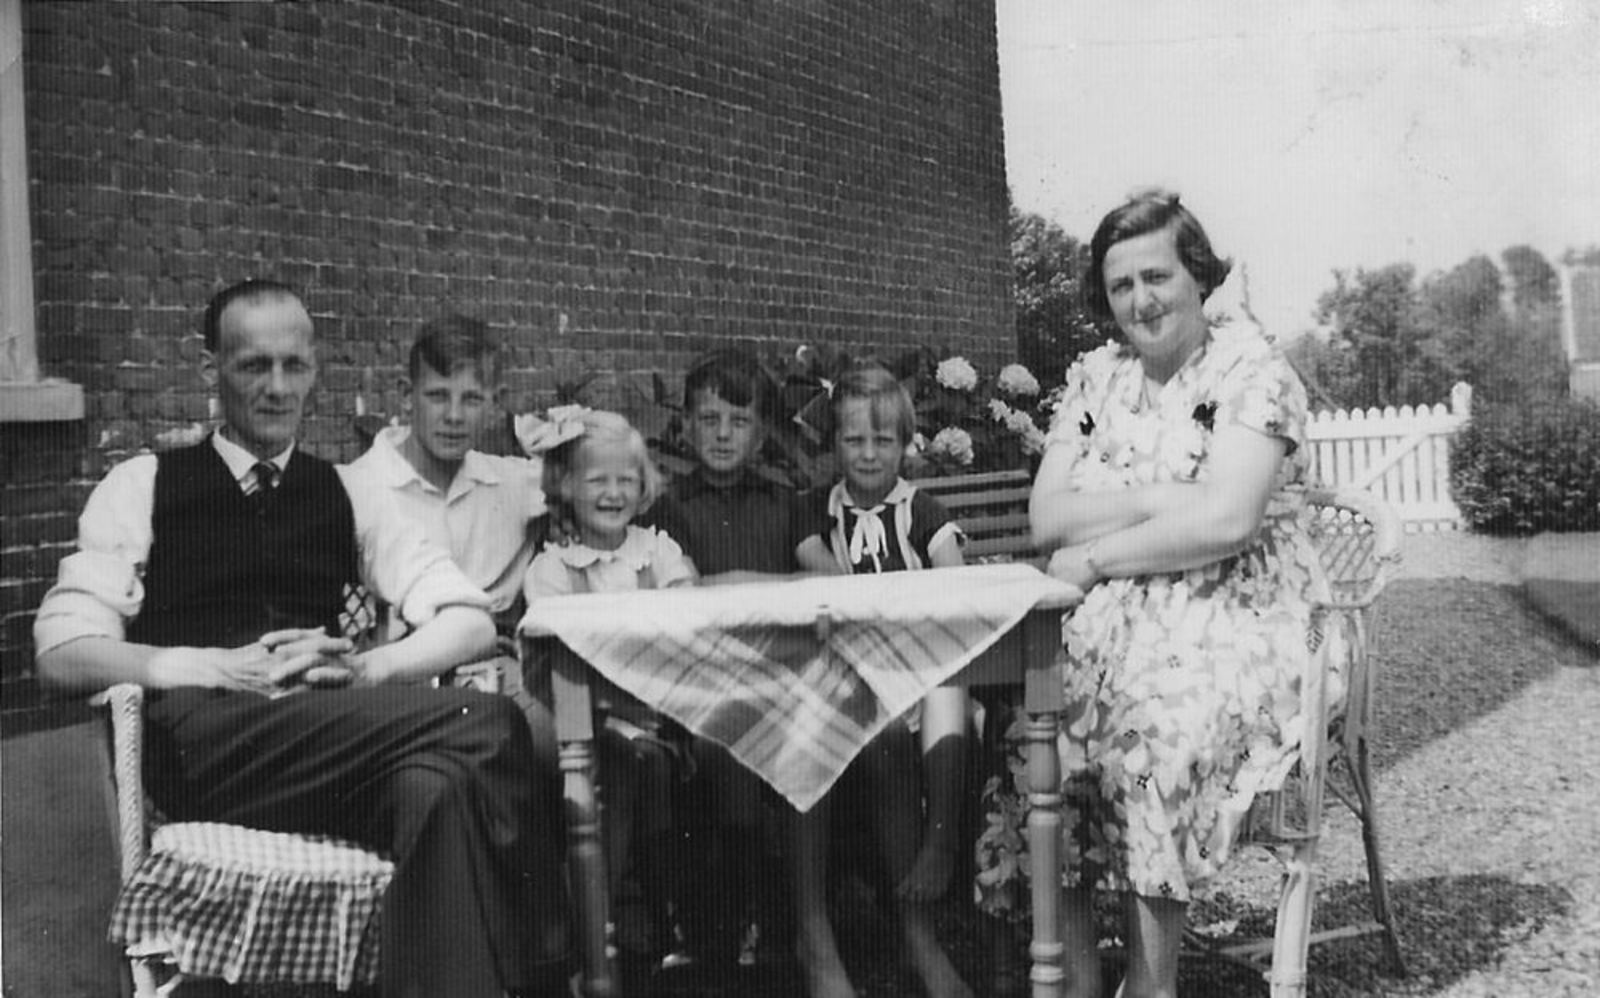 Vijfhuizen Onbekend Gezin 01 1955